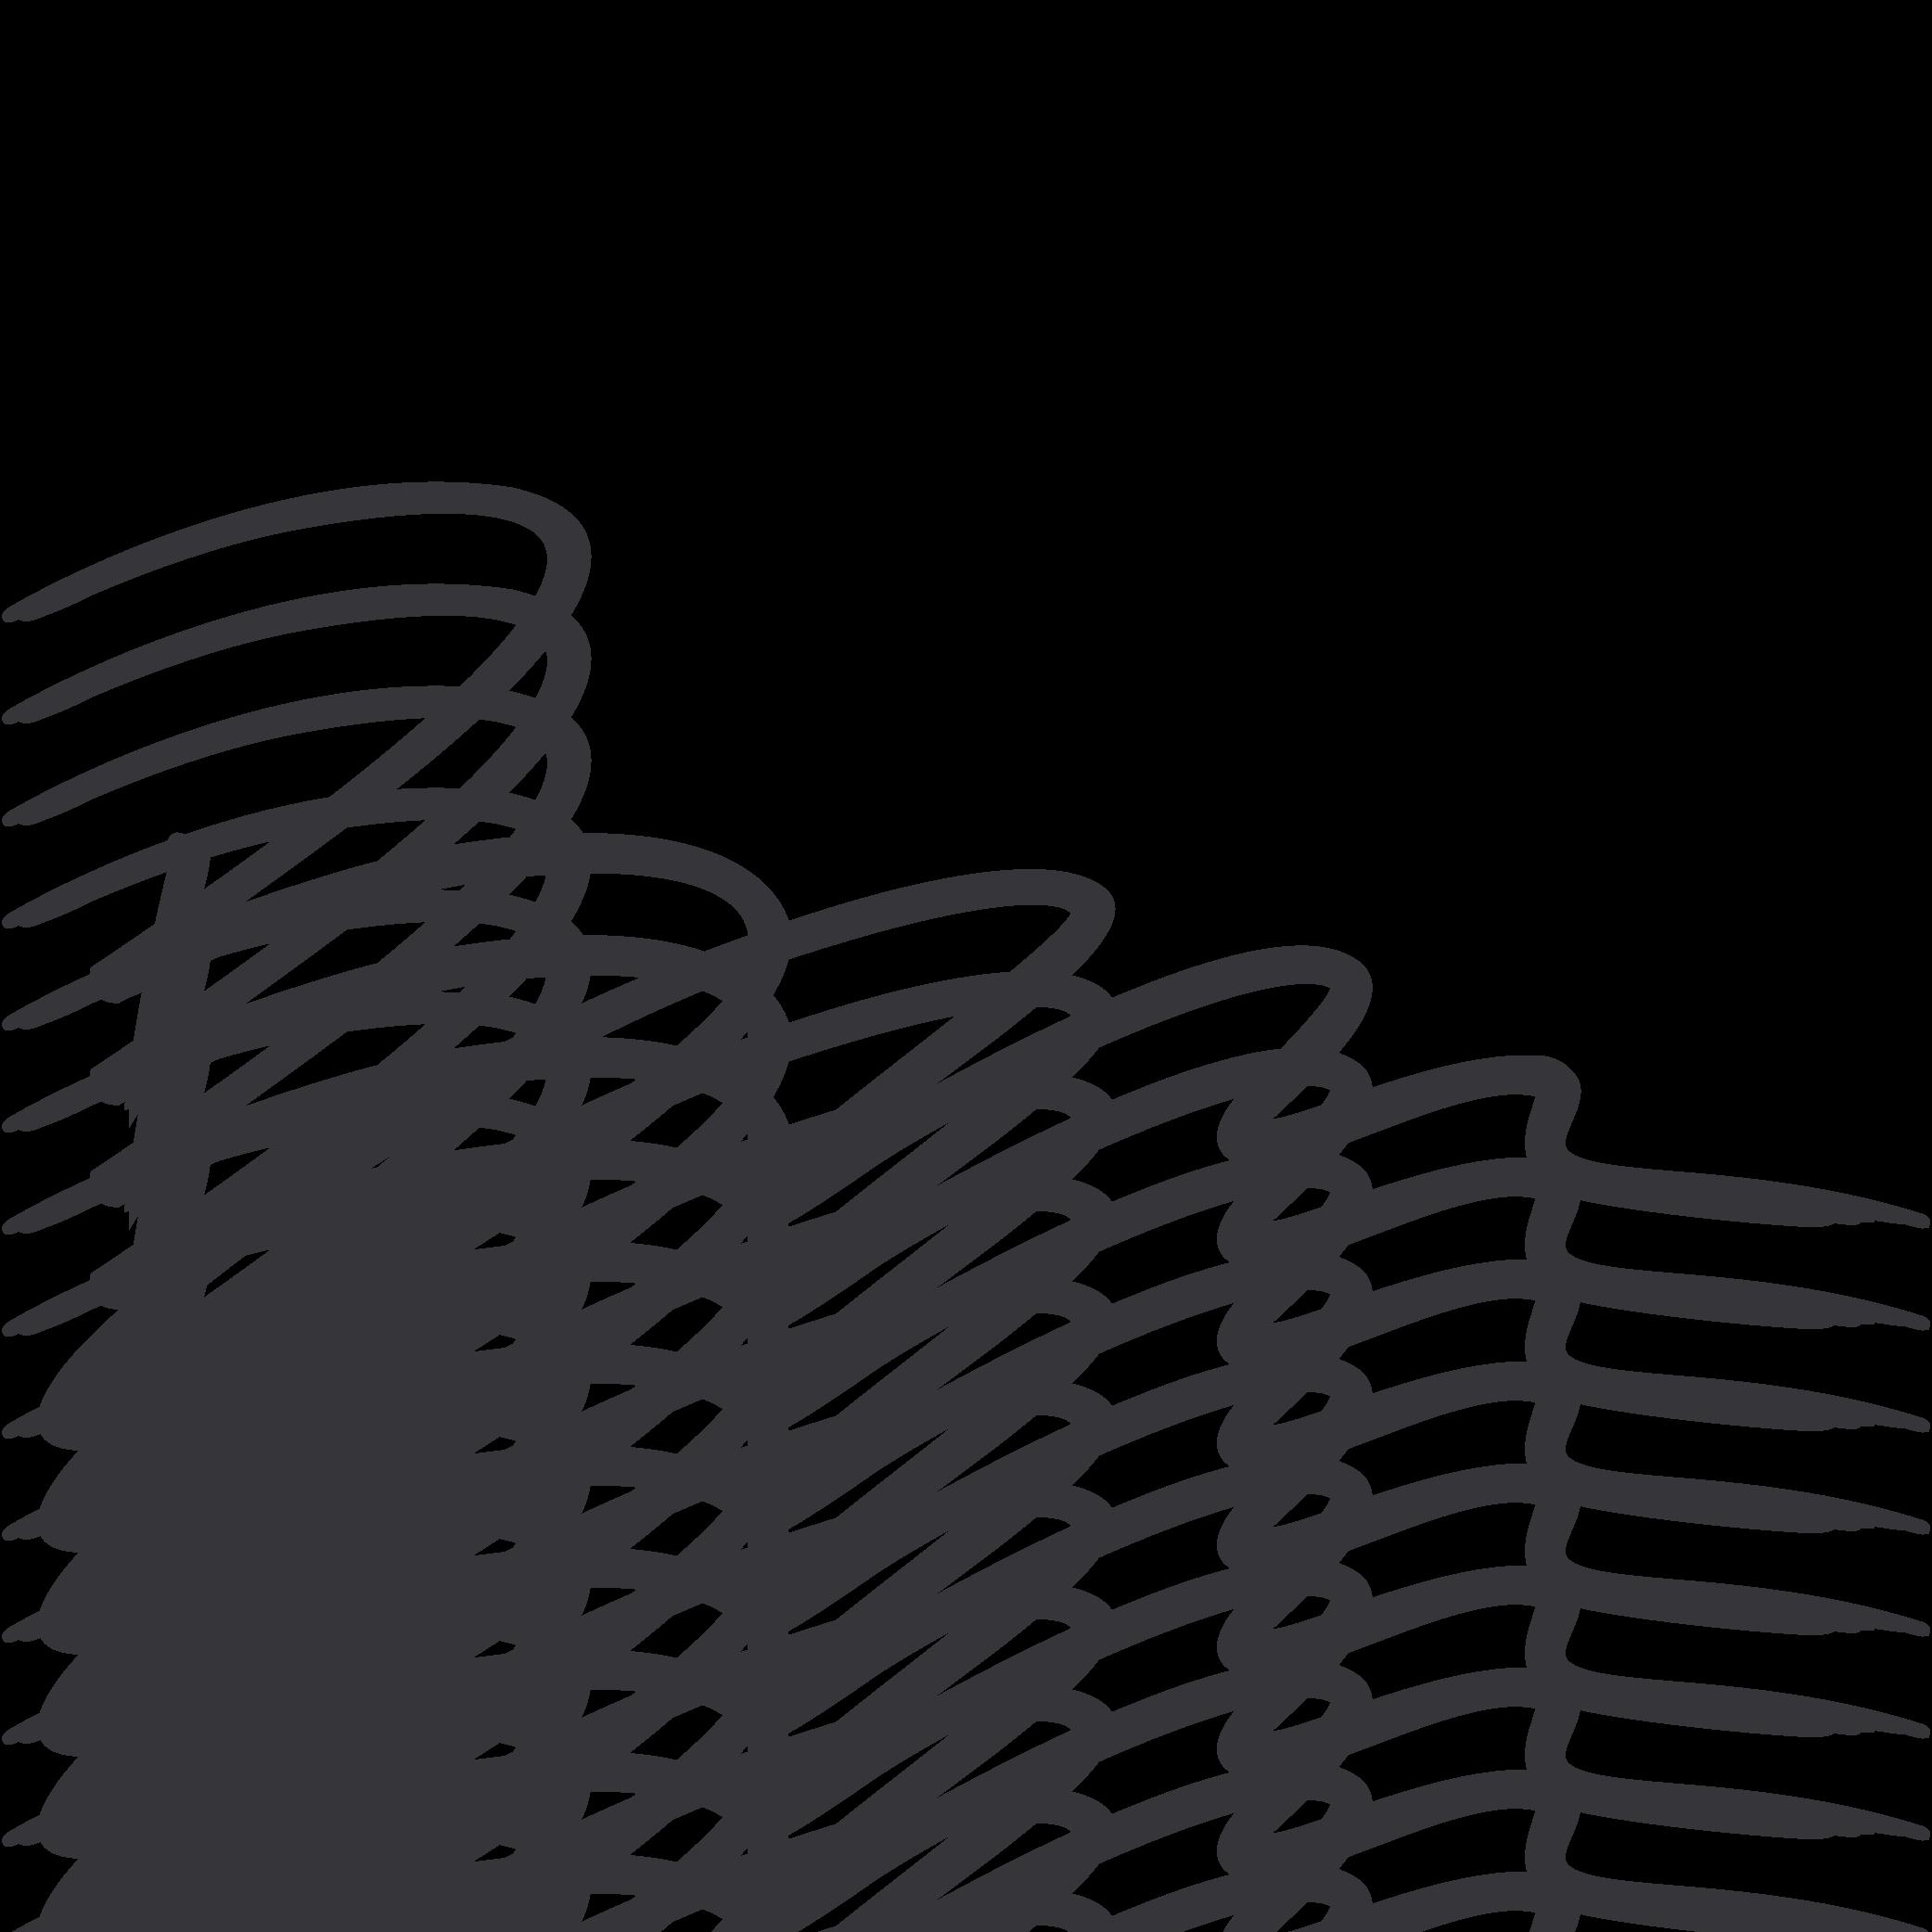 Logomark_black.png